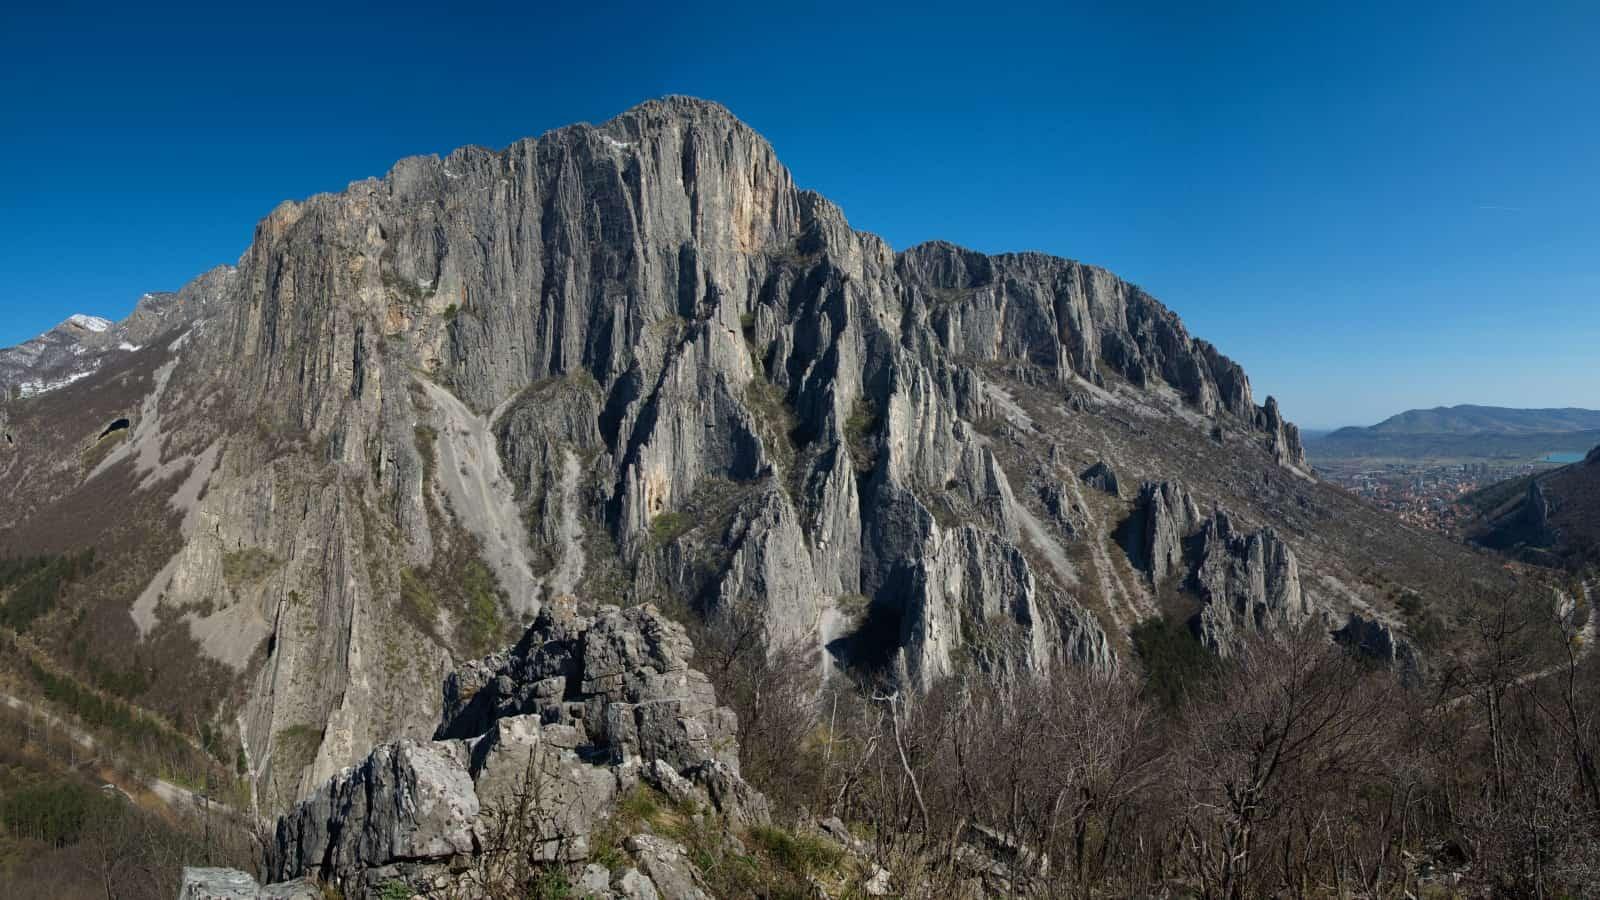 The climbing rocks at Vratsata gorge - Panorama view of Vrachanski Balkan Nature Park - photo: Vrachanski Balkan Nature Park/Krasimir Lakovski